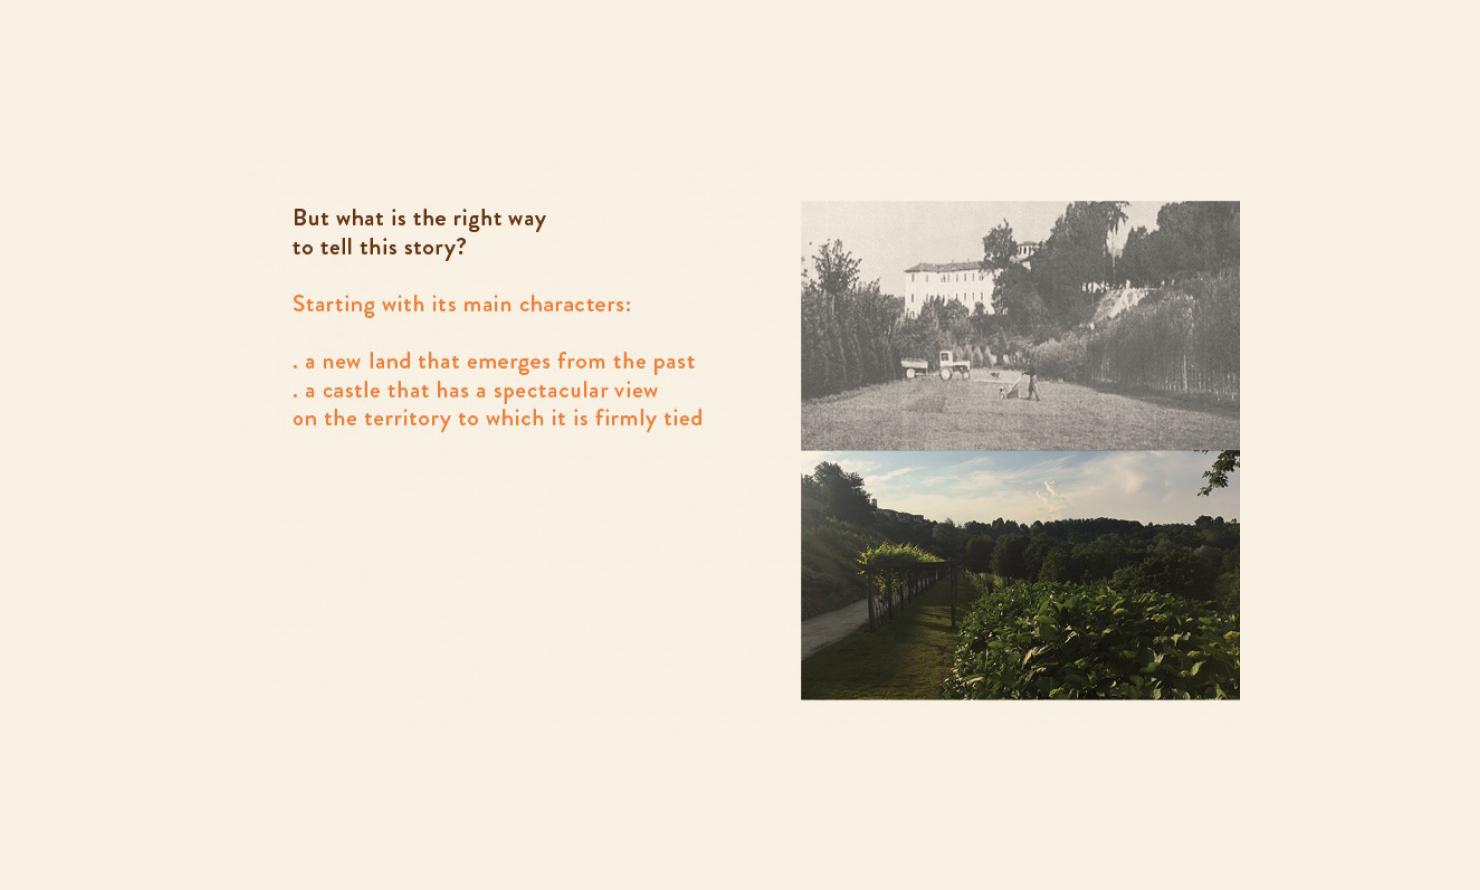 https://www.kubelibre.com/uploads/Slider-work-tutti-clienti/manital-vistaterra-l-agriparco-che-abbraccia-il-castello-brand-identity-brand-strategy-3.jpg